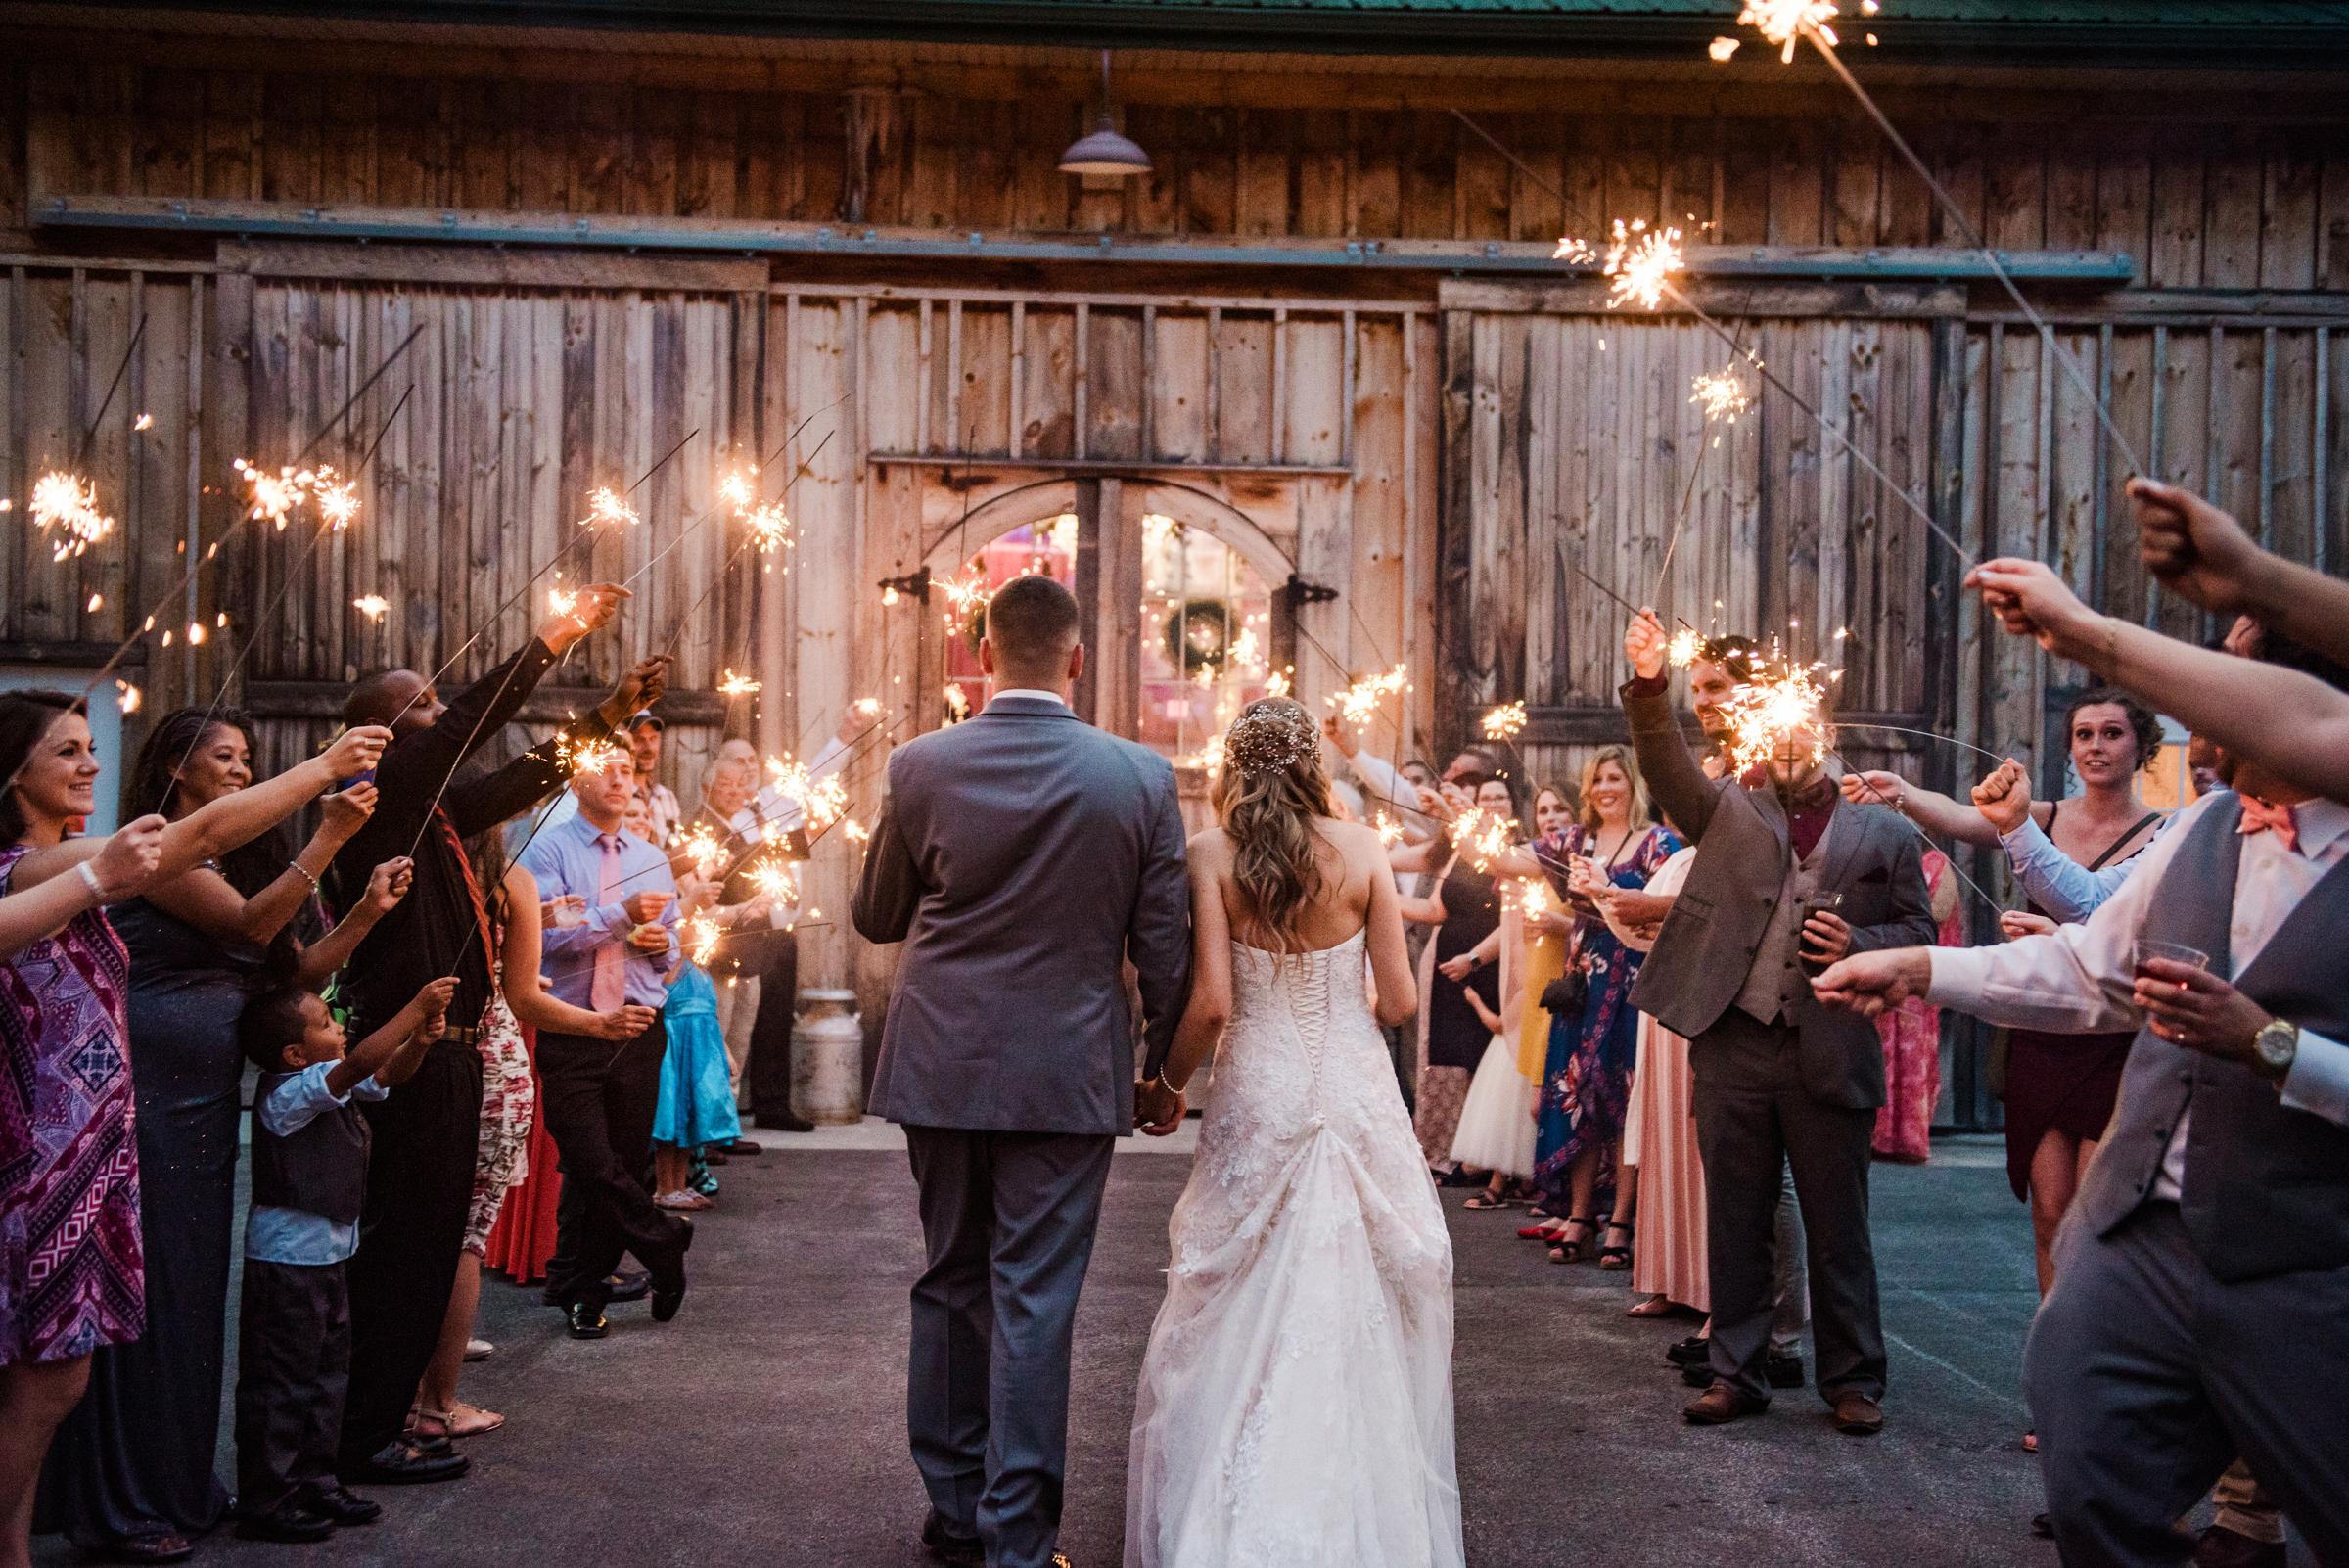 Wolf_Oak_Acres_Central_NY_Wedding_JILL_STUDIO_Rochester_NY_Photographer_DSC_9121.jpg